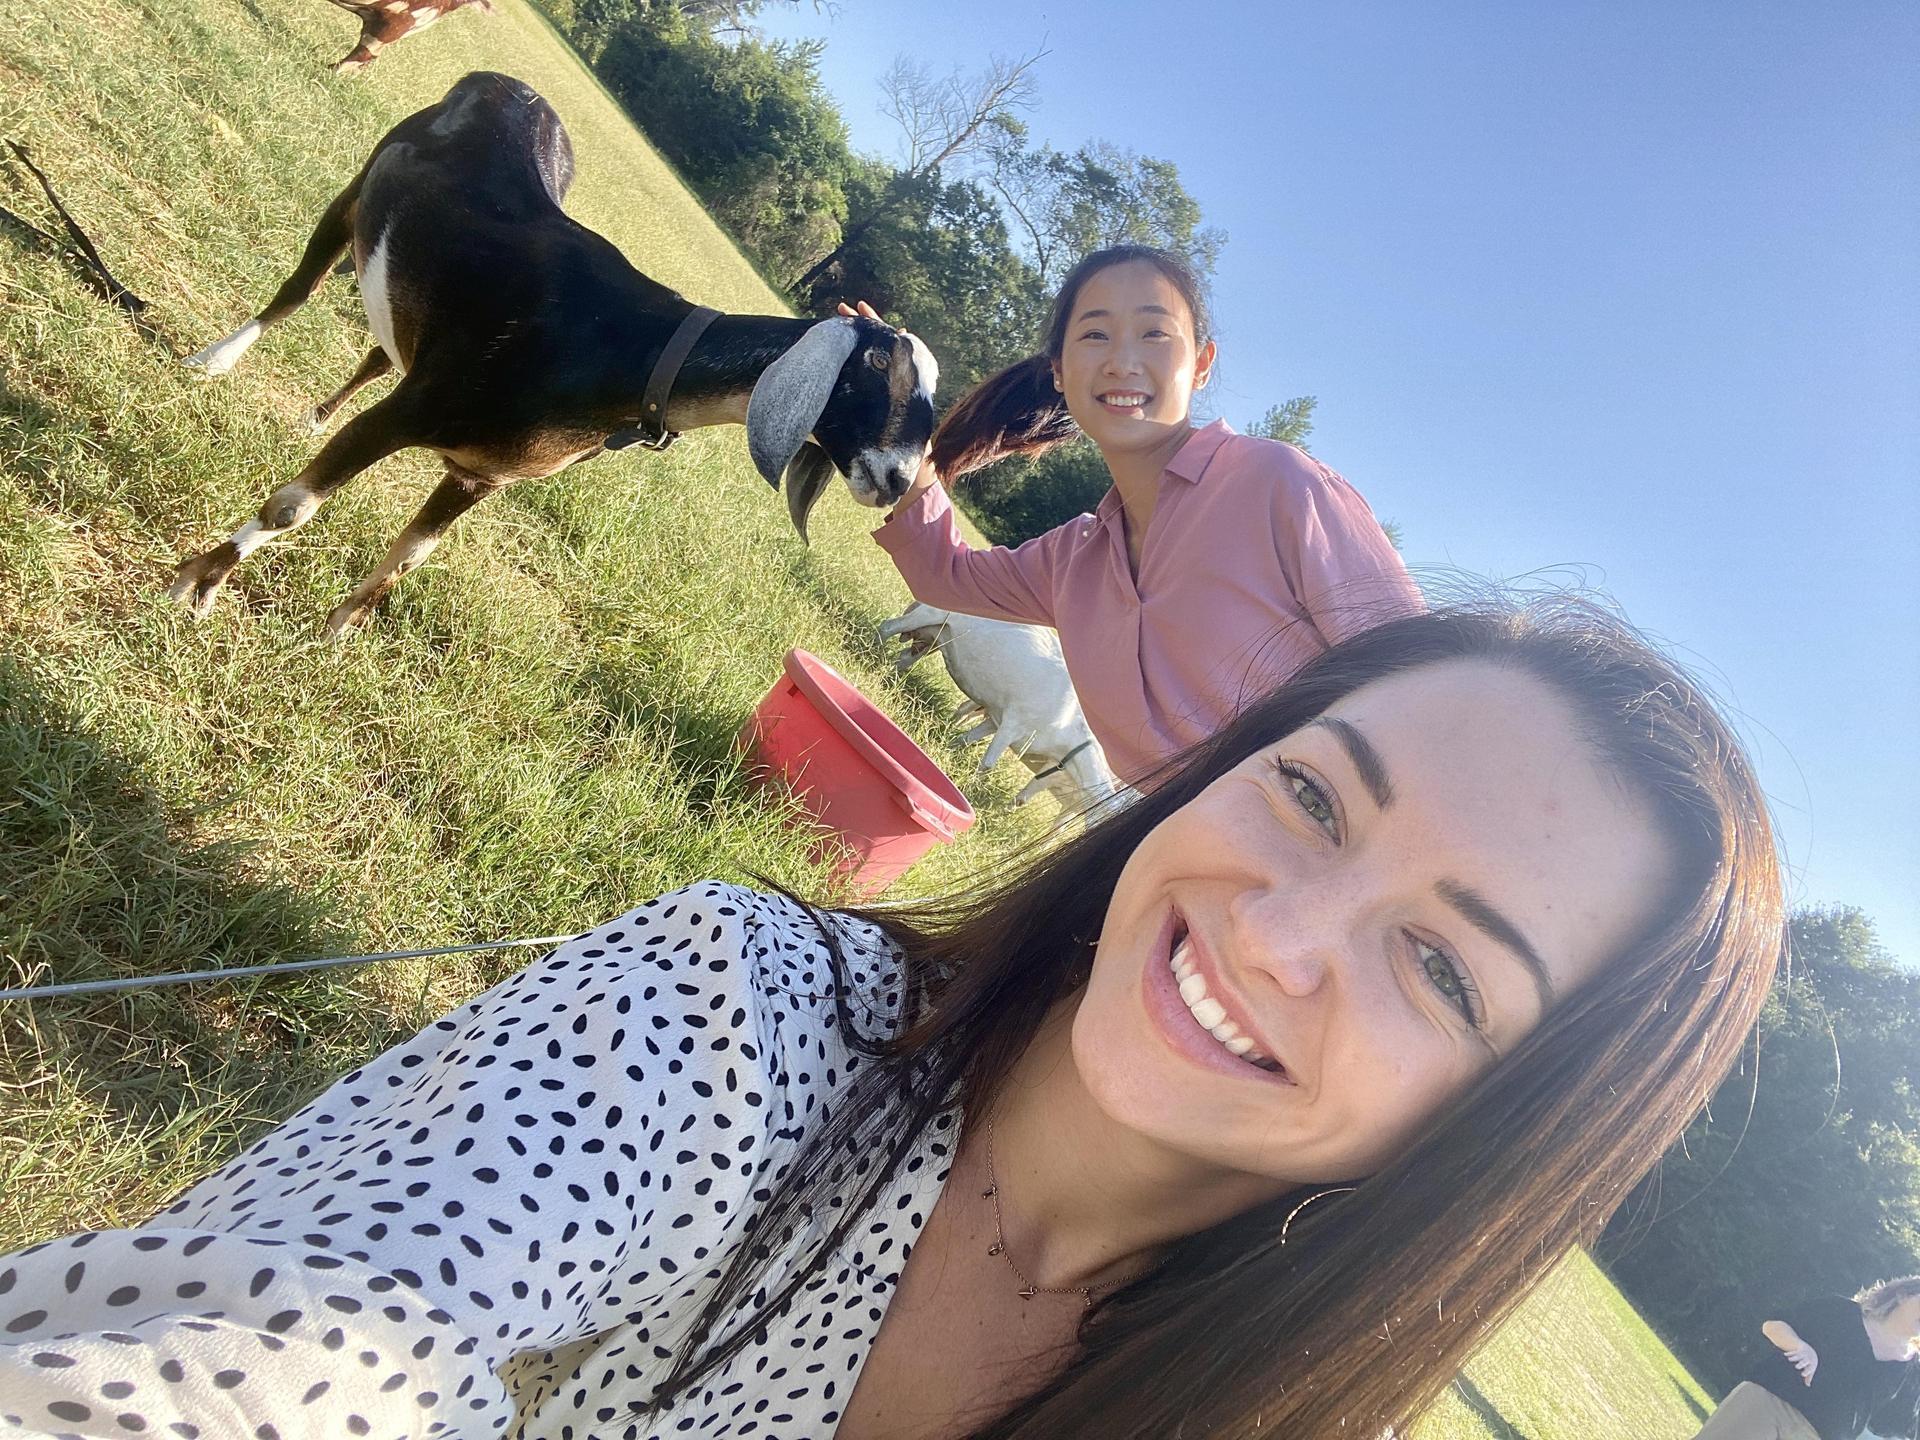 Red Goat Farm